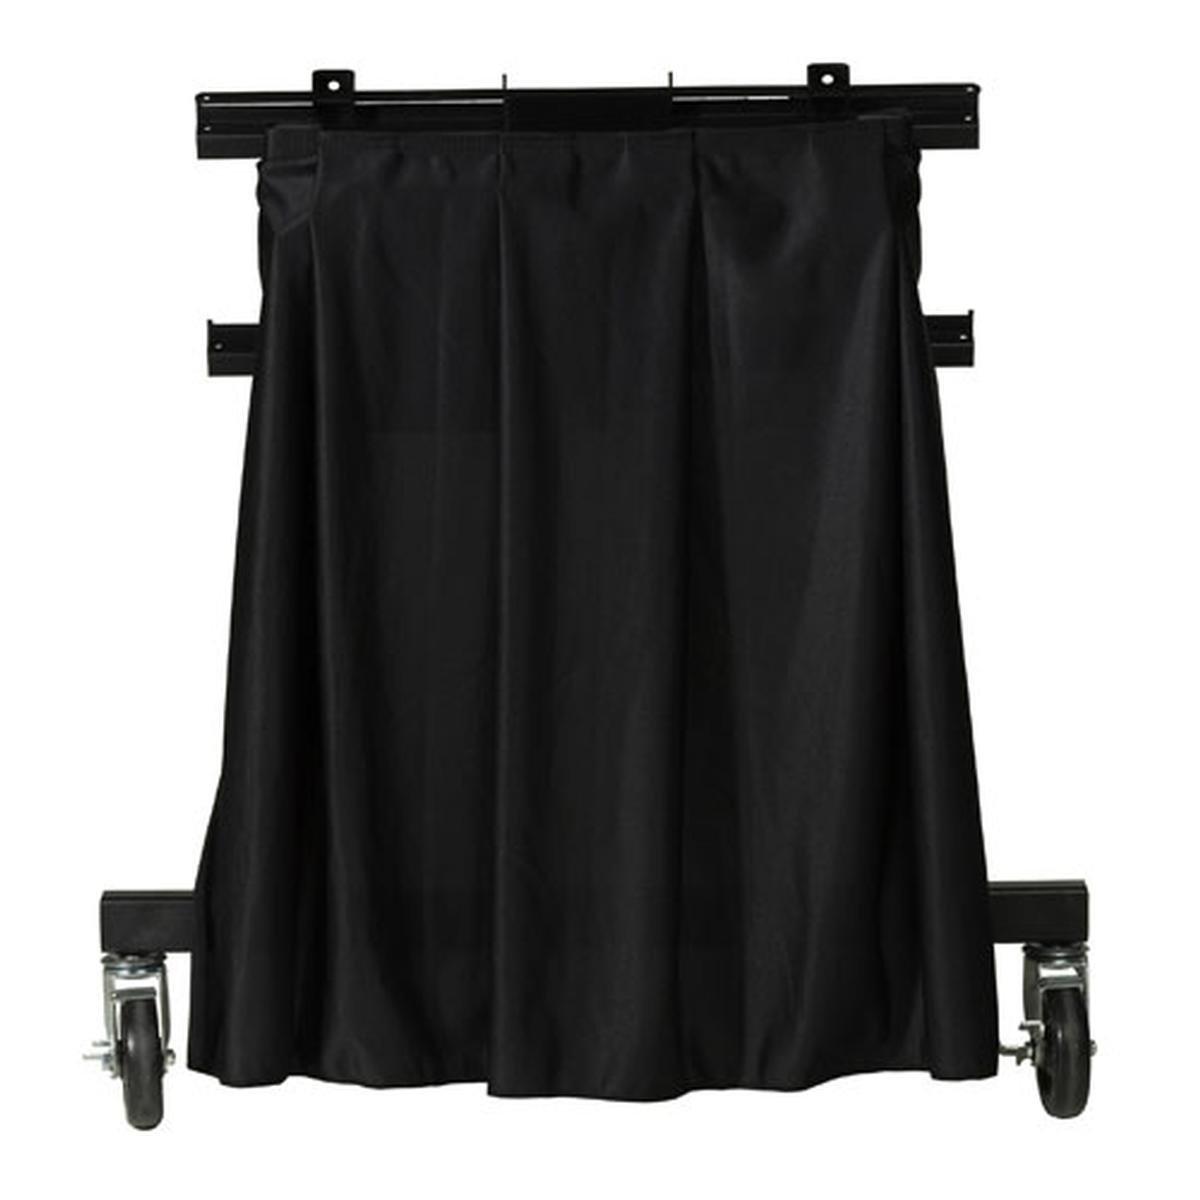 Da-Lite Skirt - Drapery for Confidence Monitor Stand